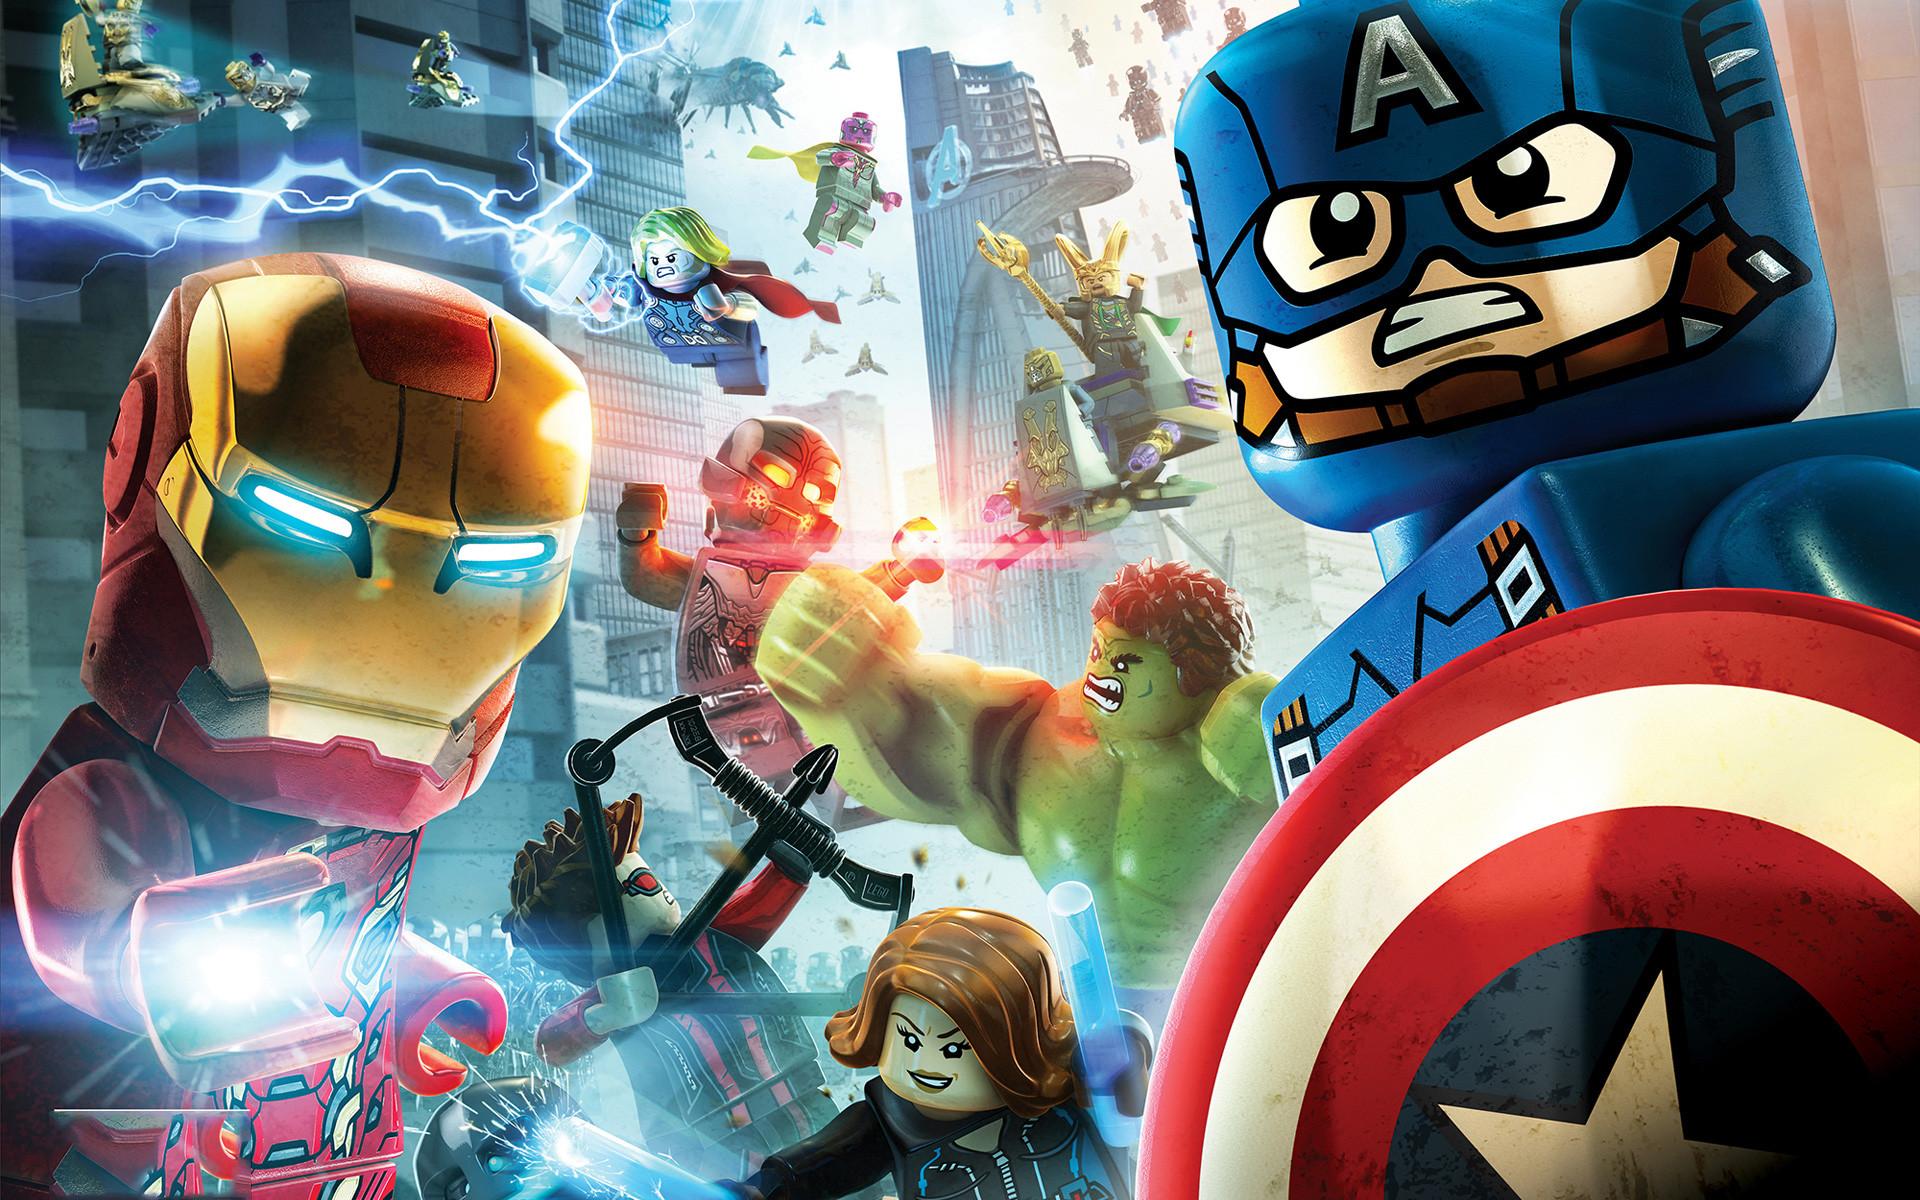 Lego avengers wallpaper hd 74 images 2560x1600 batman superman together lego marvel super heroes 2560x1600 wallpaper voltagebd Gallery